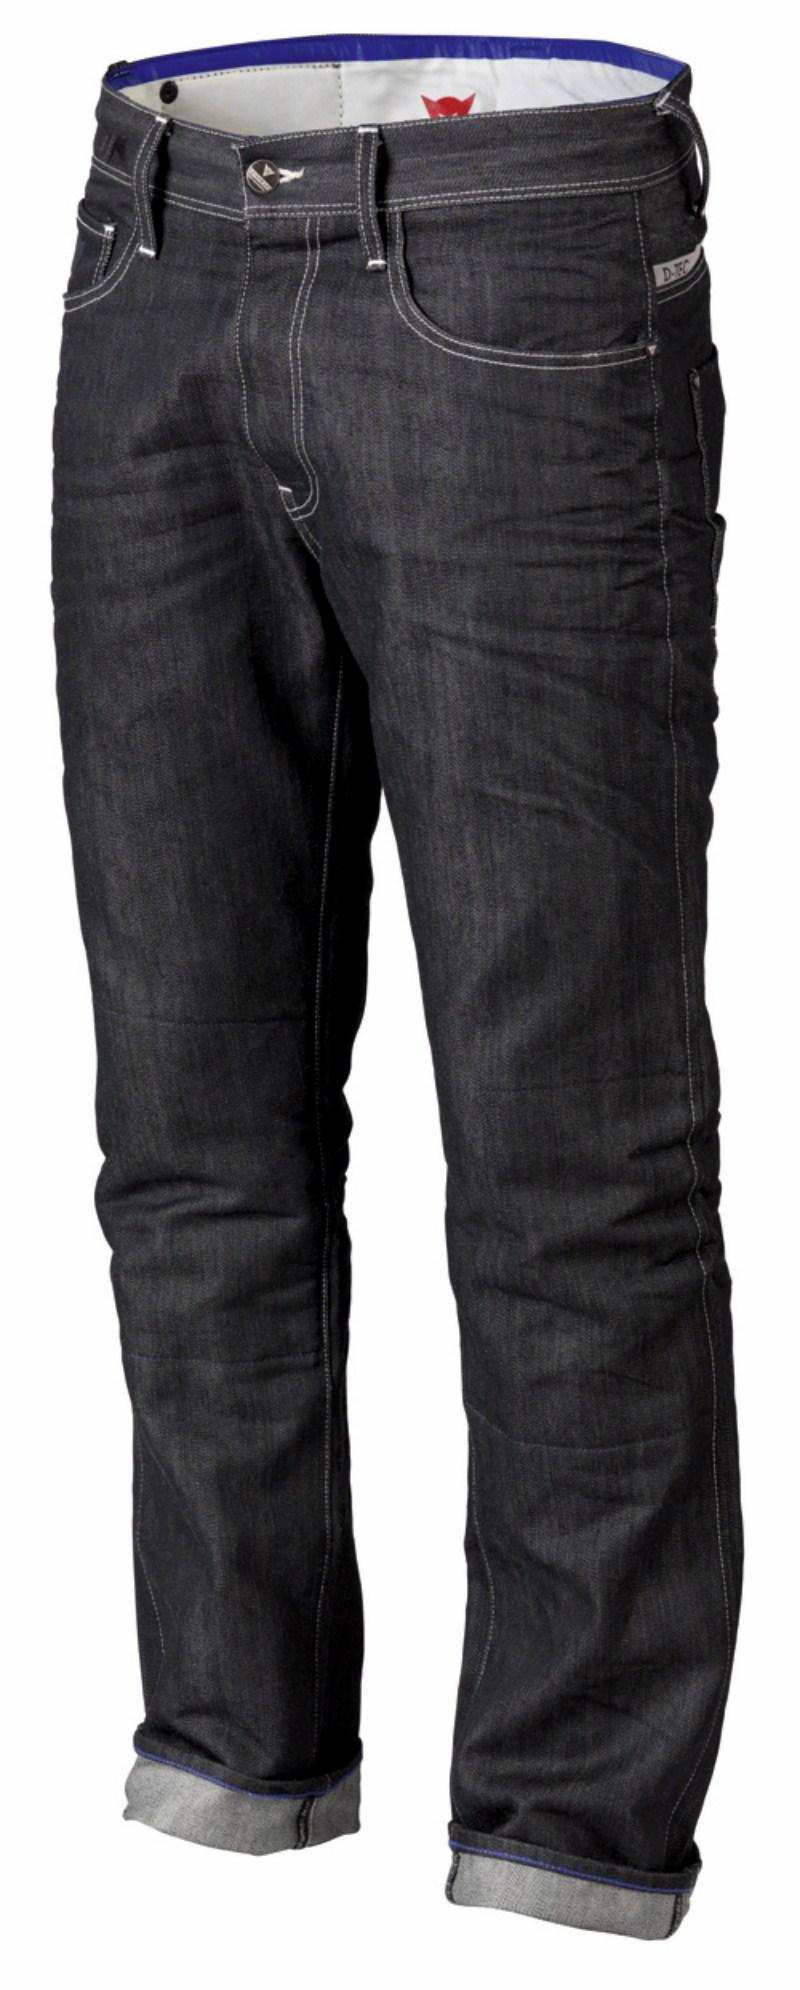 Dainese D6 Kevlar motorcycle jeans col. Denim